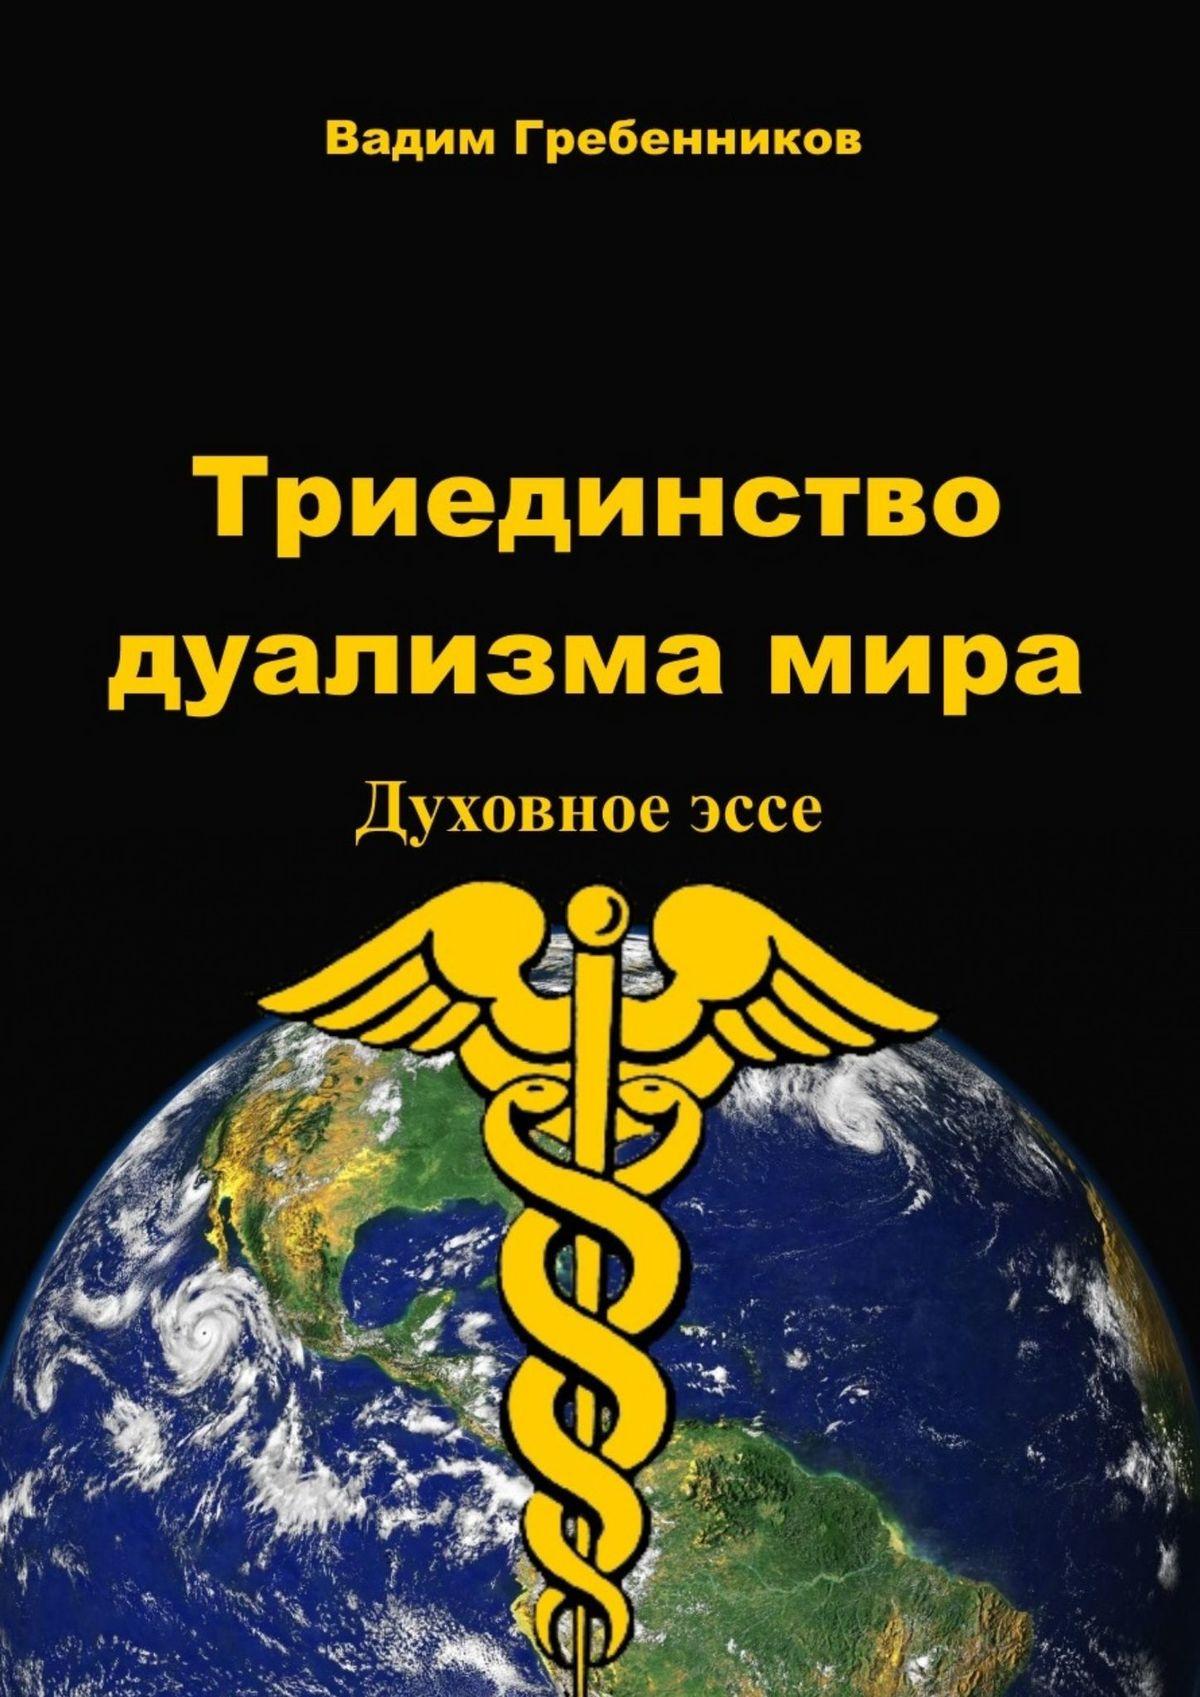 Вадим Гребенников Триединство дуализма Мира. Духовноеэссе цена